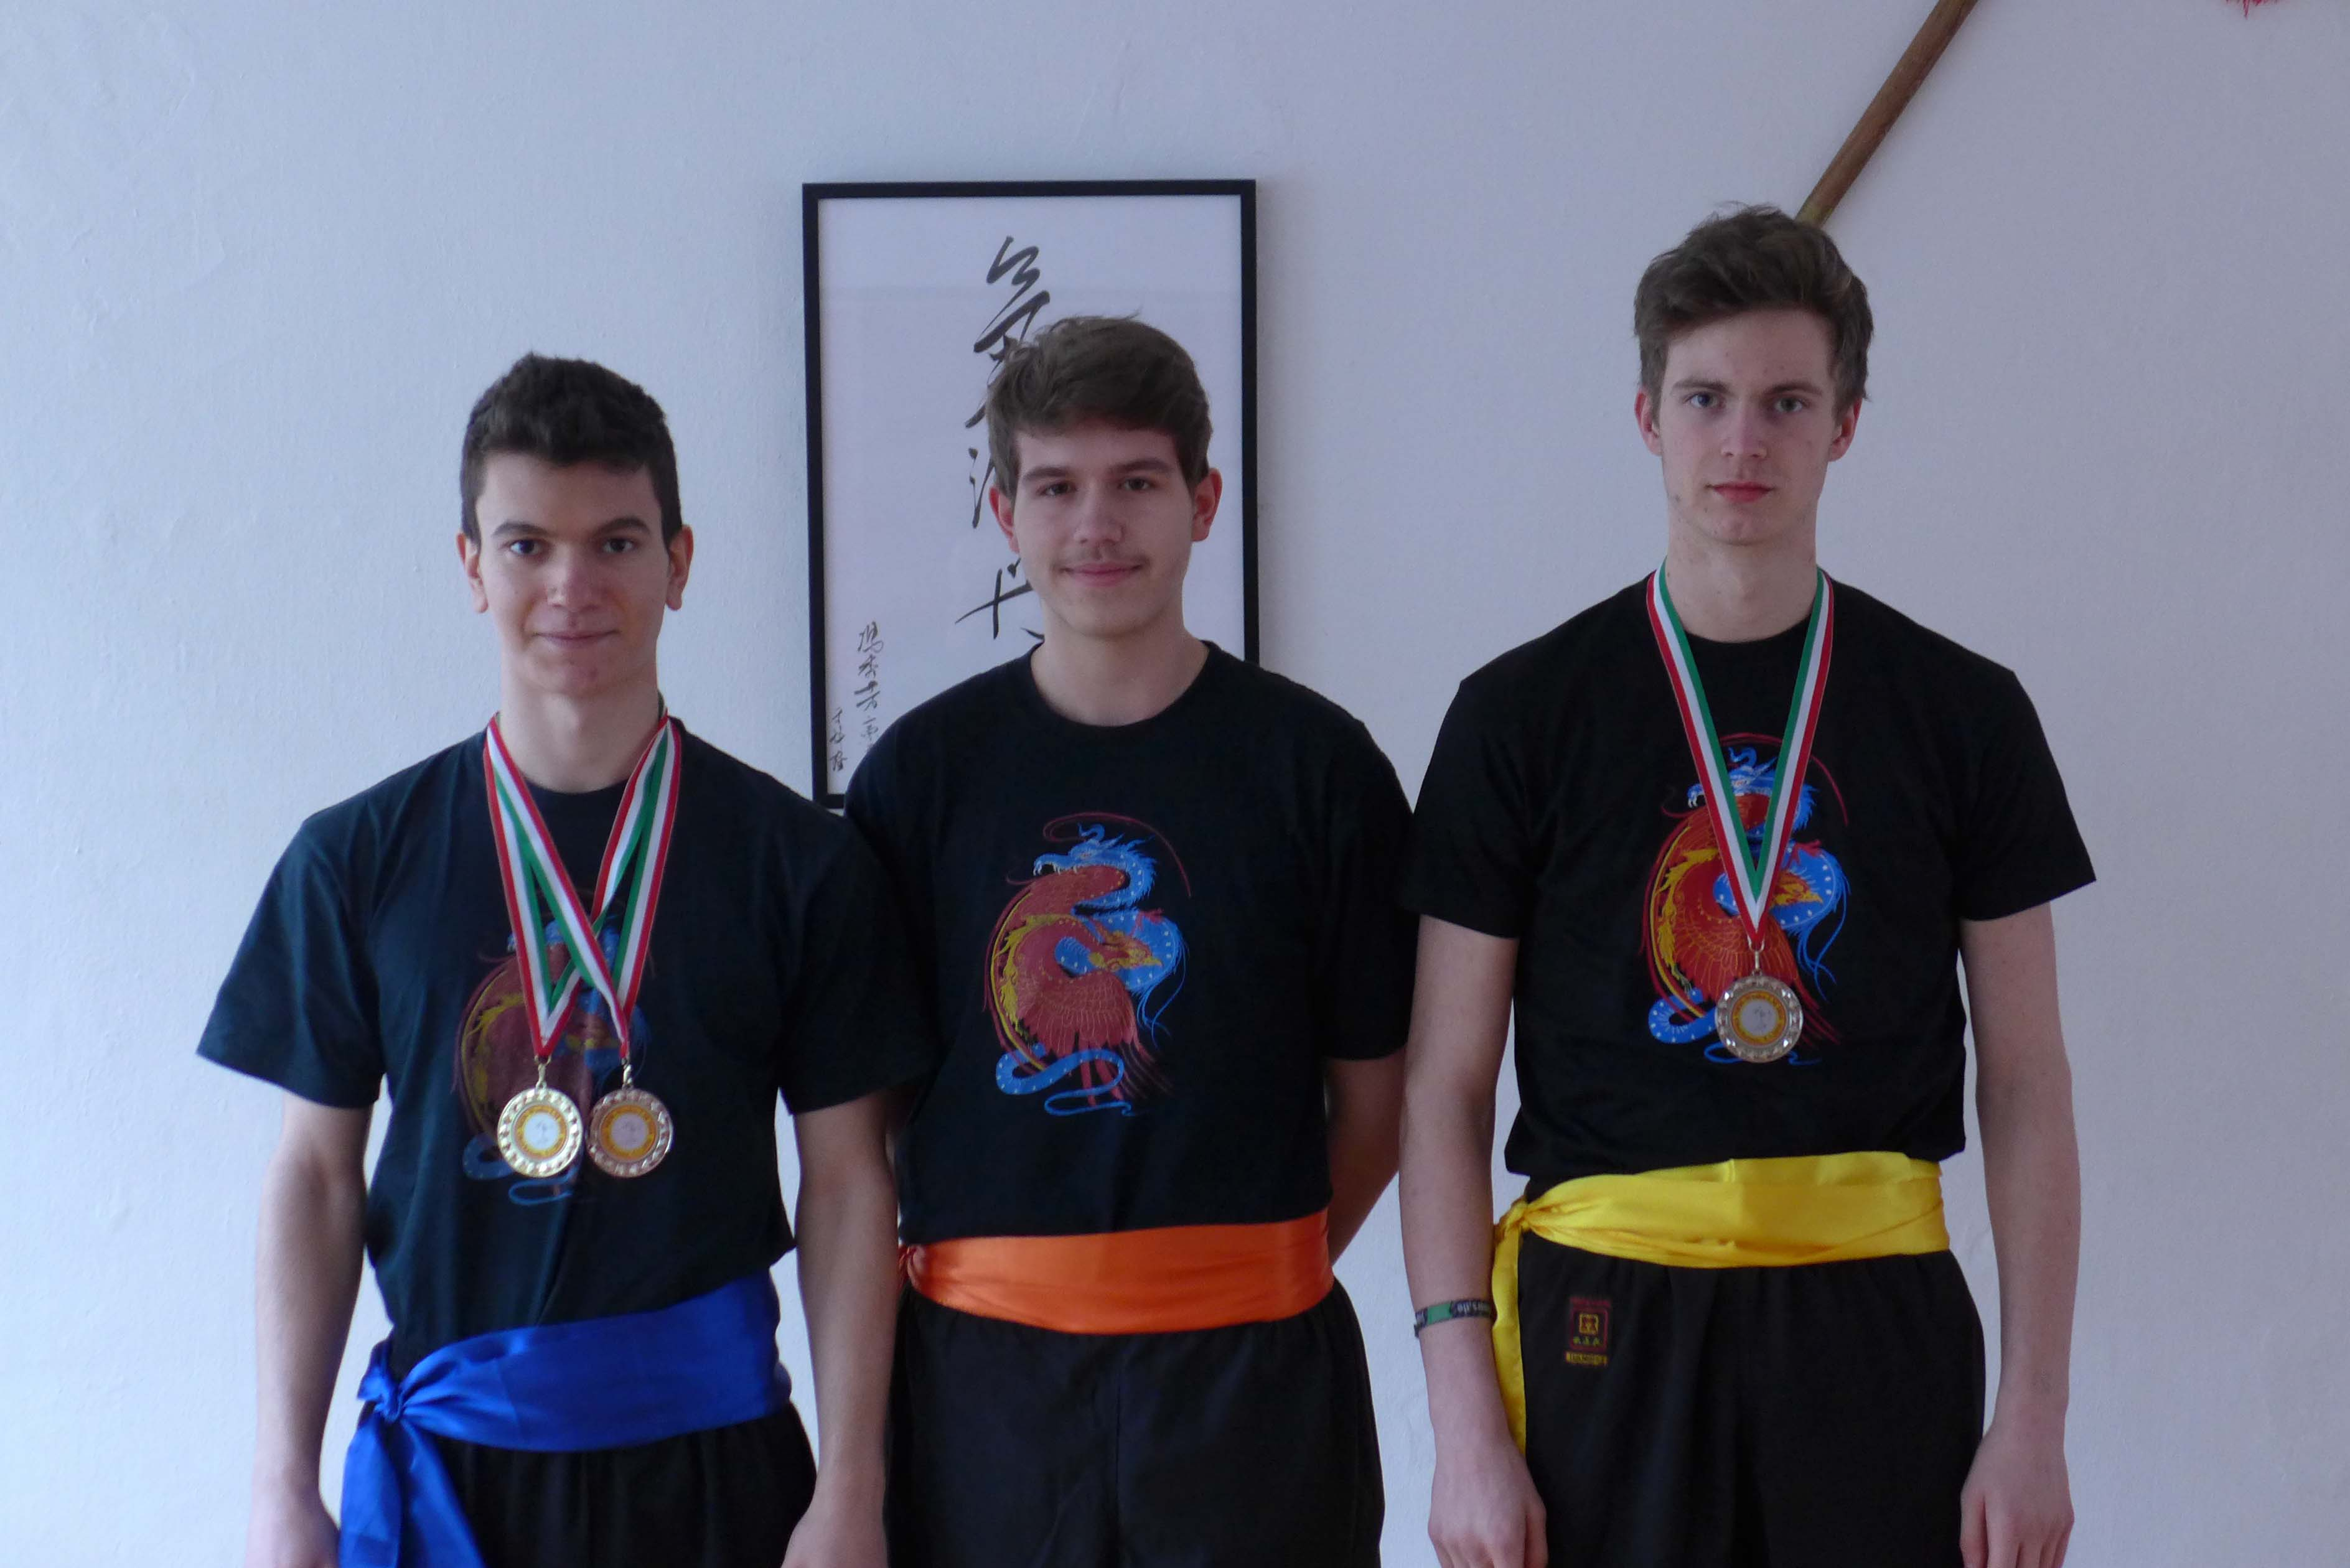 Akademie Düsseldorf Turnier Kickboxen 2016